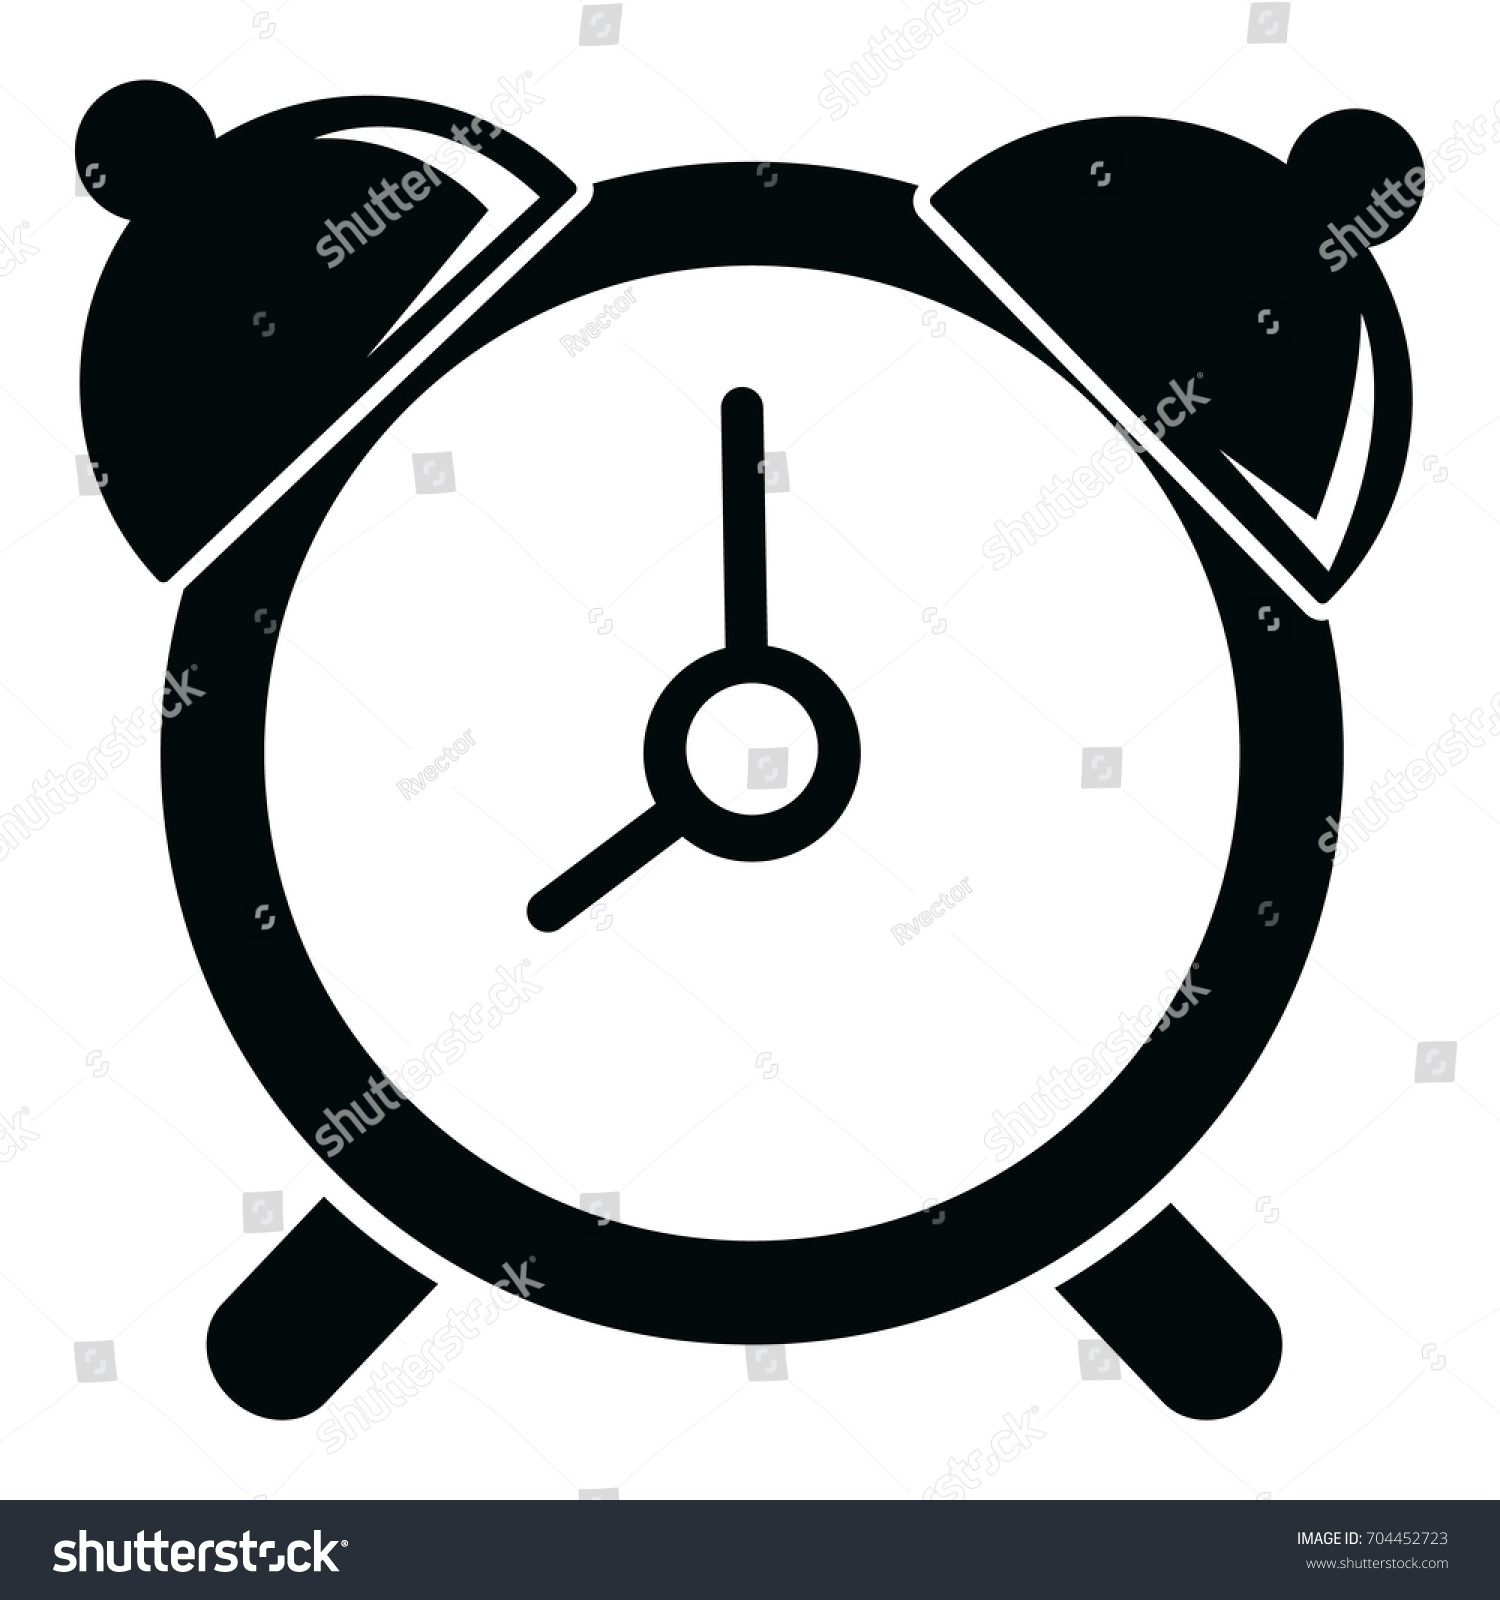 alarm clock icon simple illustration alarm stock vector 704452723 rh shutterstock com alarm clock vector freepik alarm clock vector free download